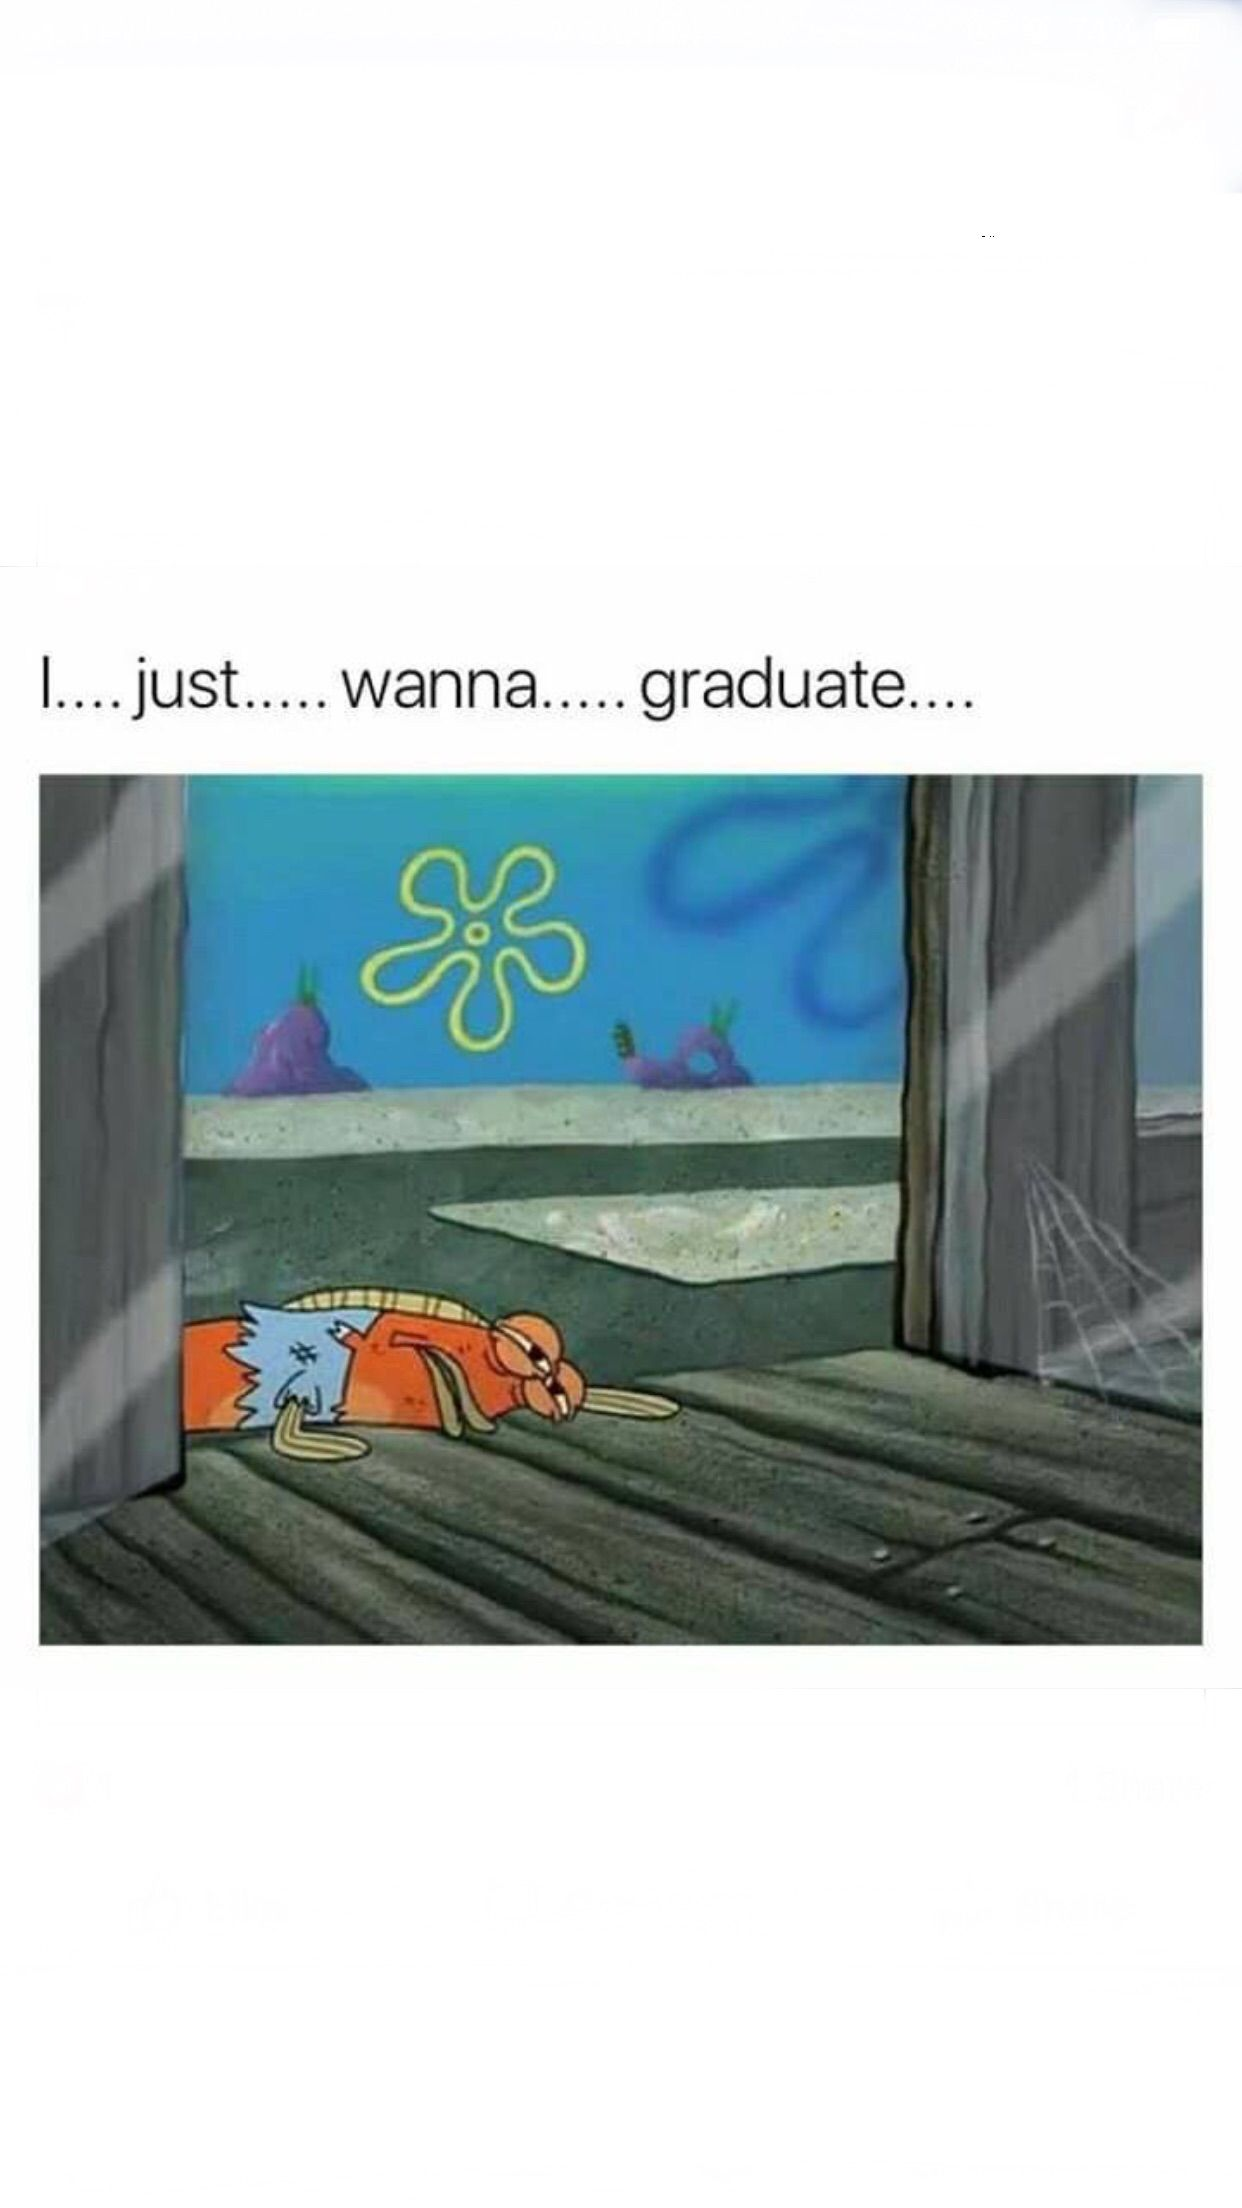 Class Of 2020 Graduation Meme Student Memes Studying Memes